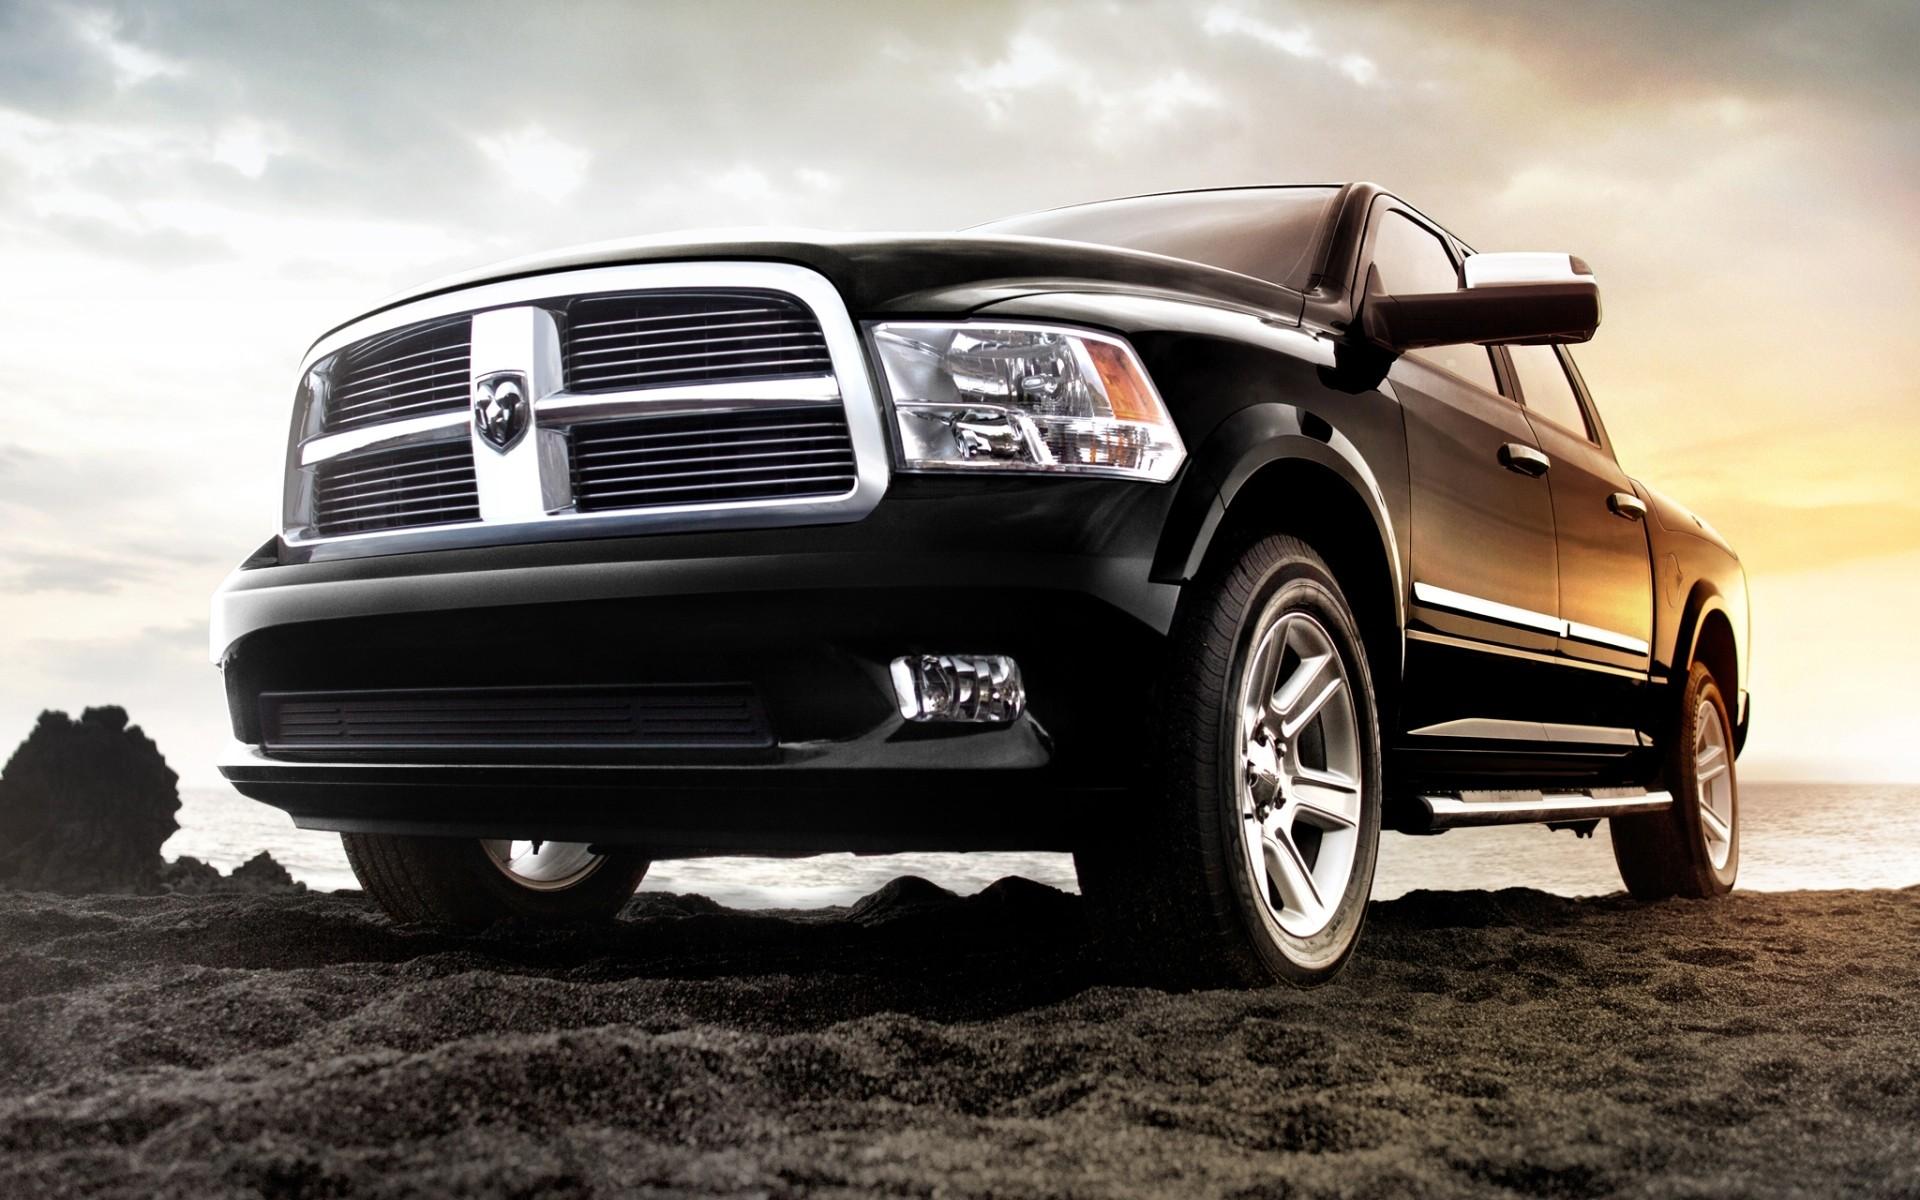 Dodge truck wallpaper hd.